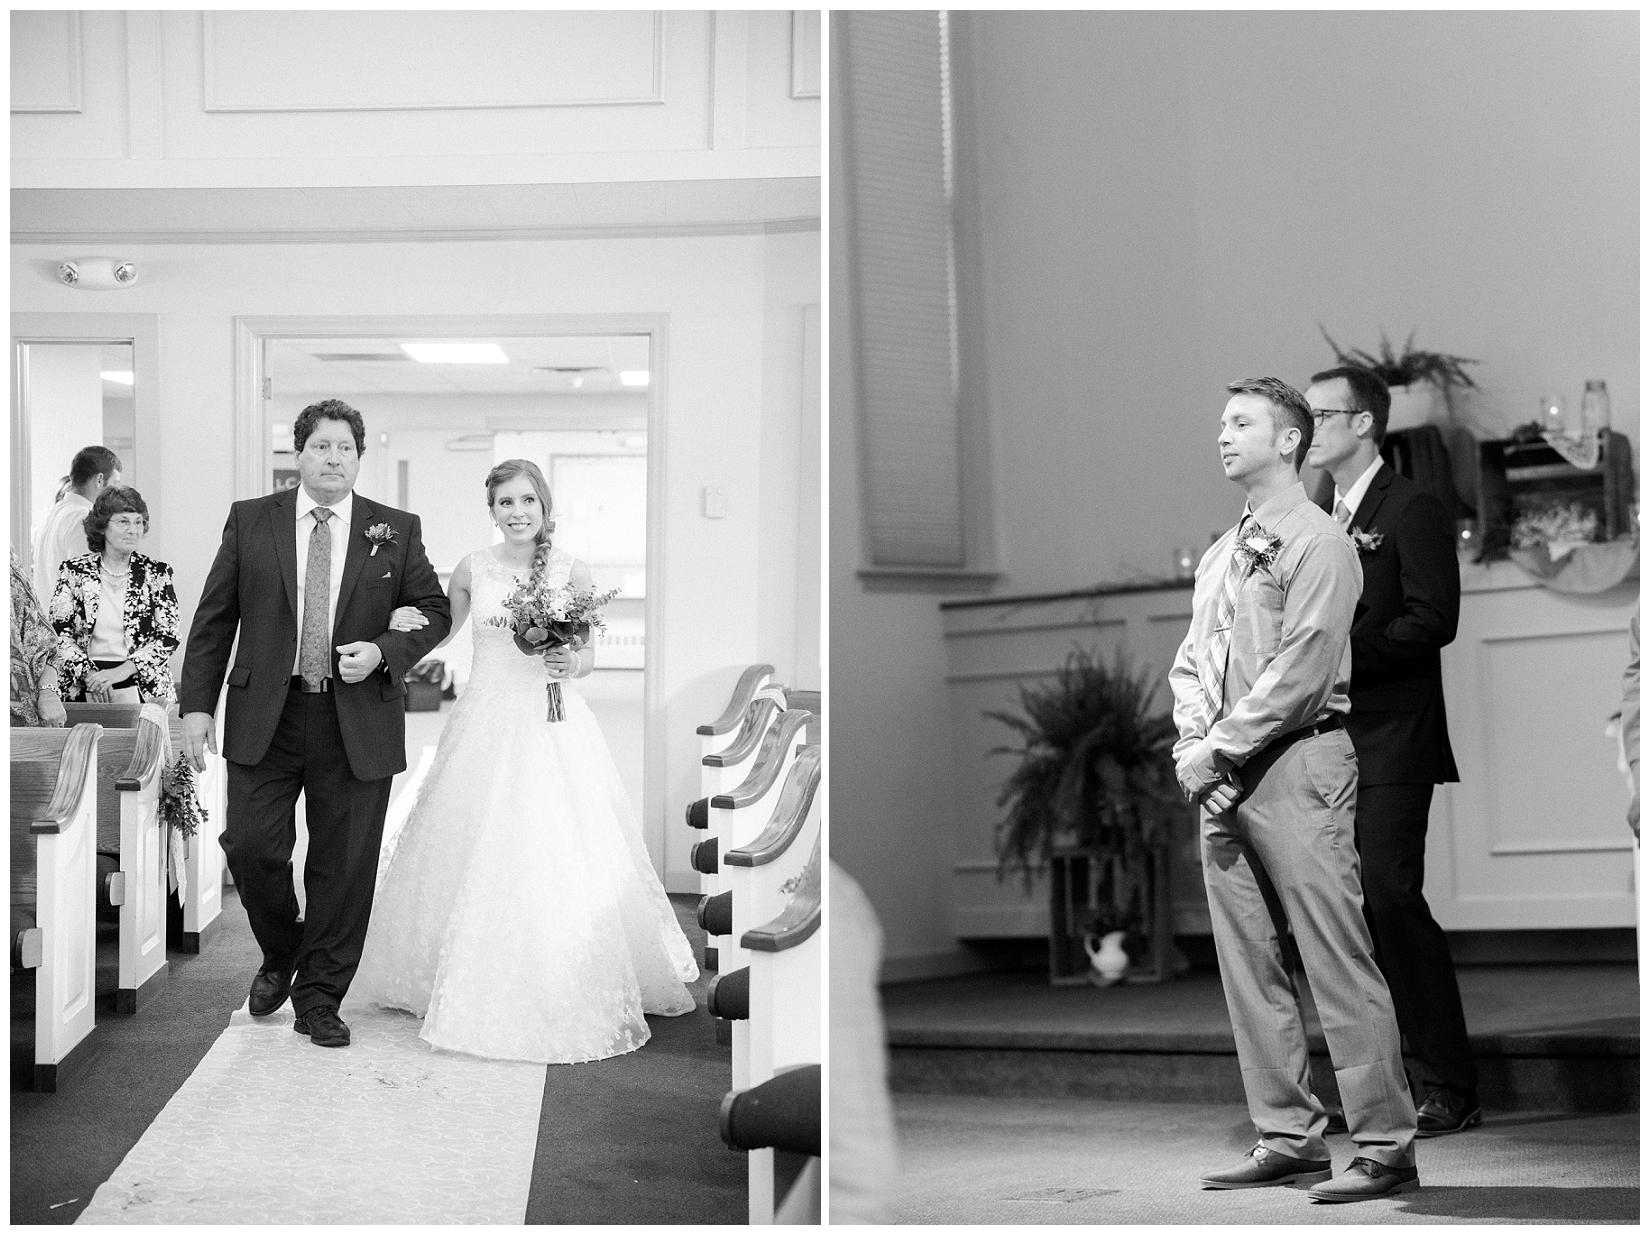 cat-alkire-wedding-photographer-indiana-chicago-indianapolis-fort-wayne_1315.jpg